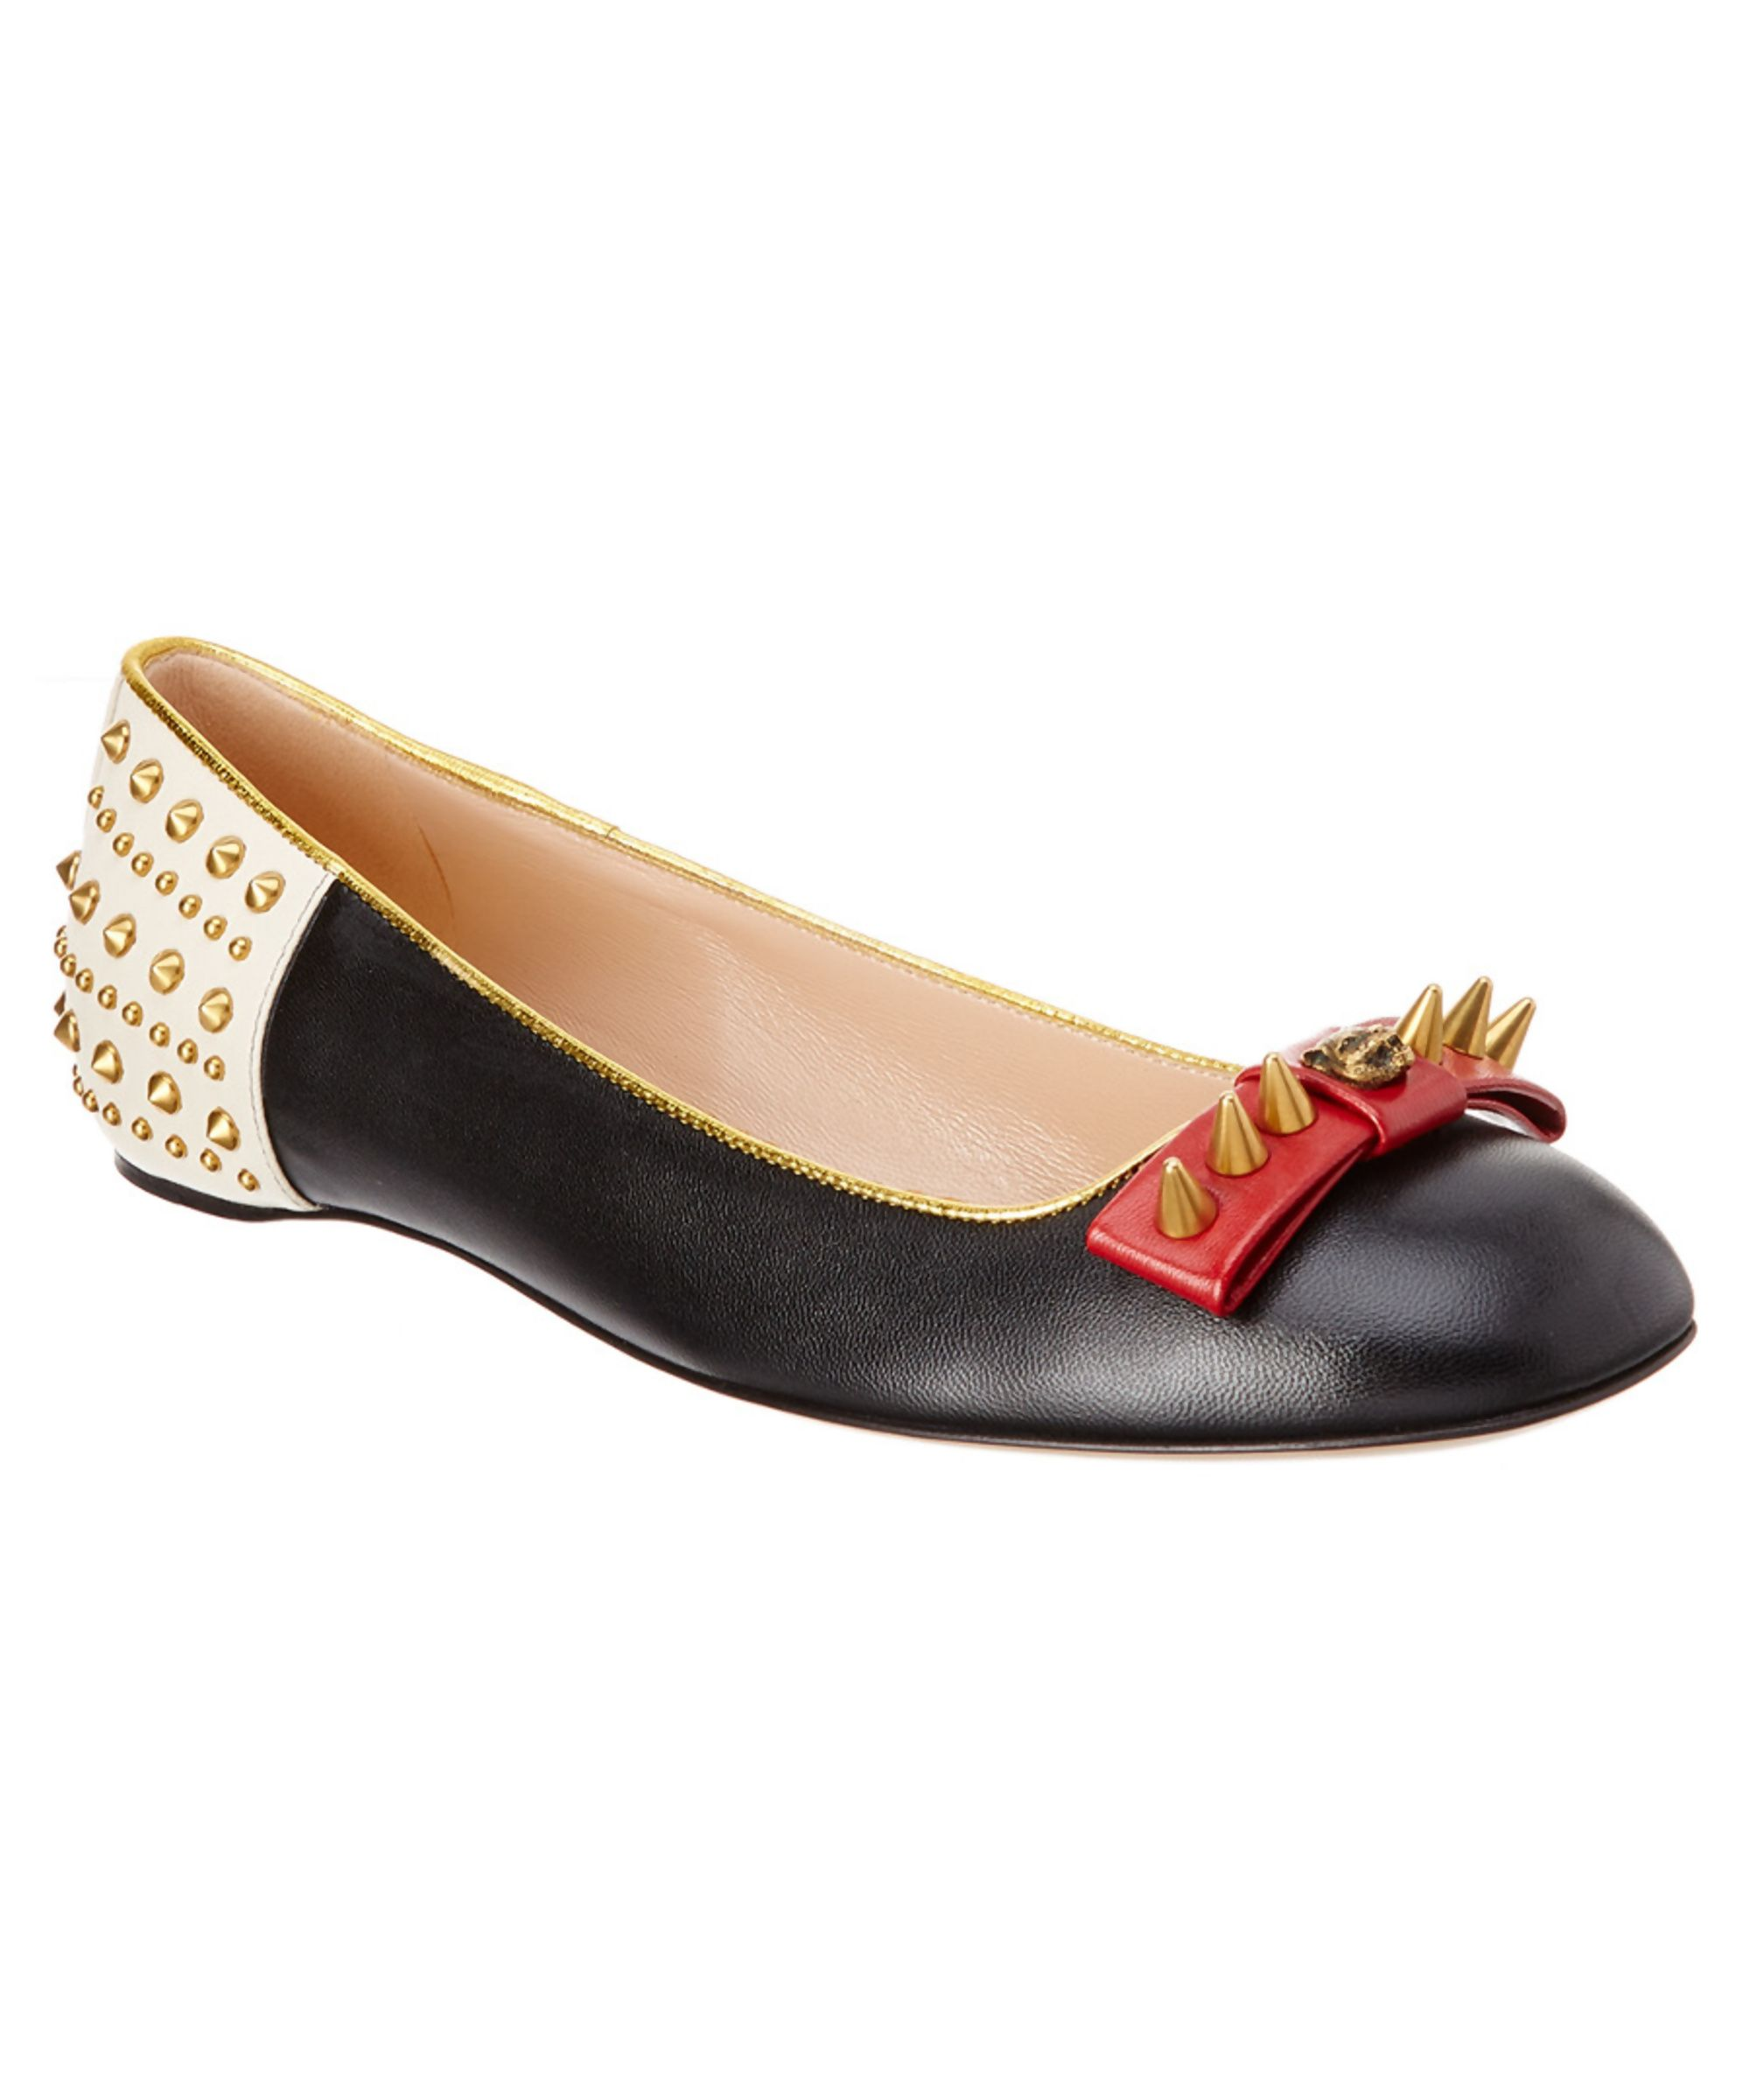 7c96126ac GUCCI   Gucci Lexi Stud Embellished Ballerina Flat #Shoes #Pumps & High  Heels #GUCCI